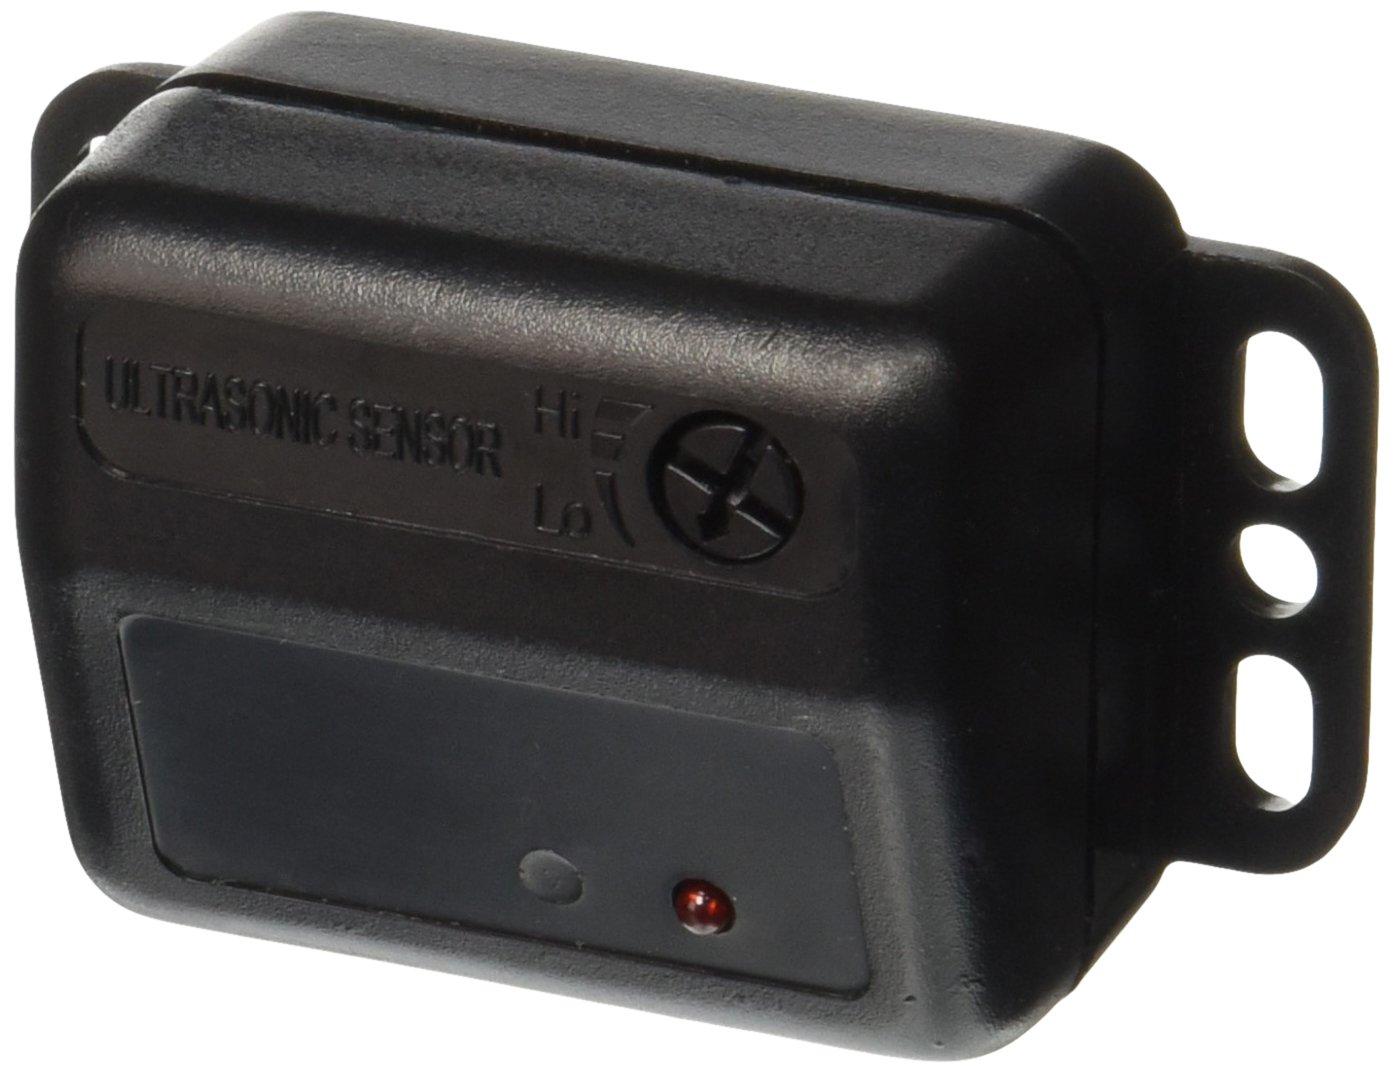 Stellar 200579 Bi-Directional Ultra Sonic Sensor 2 Head